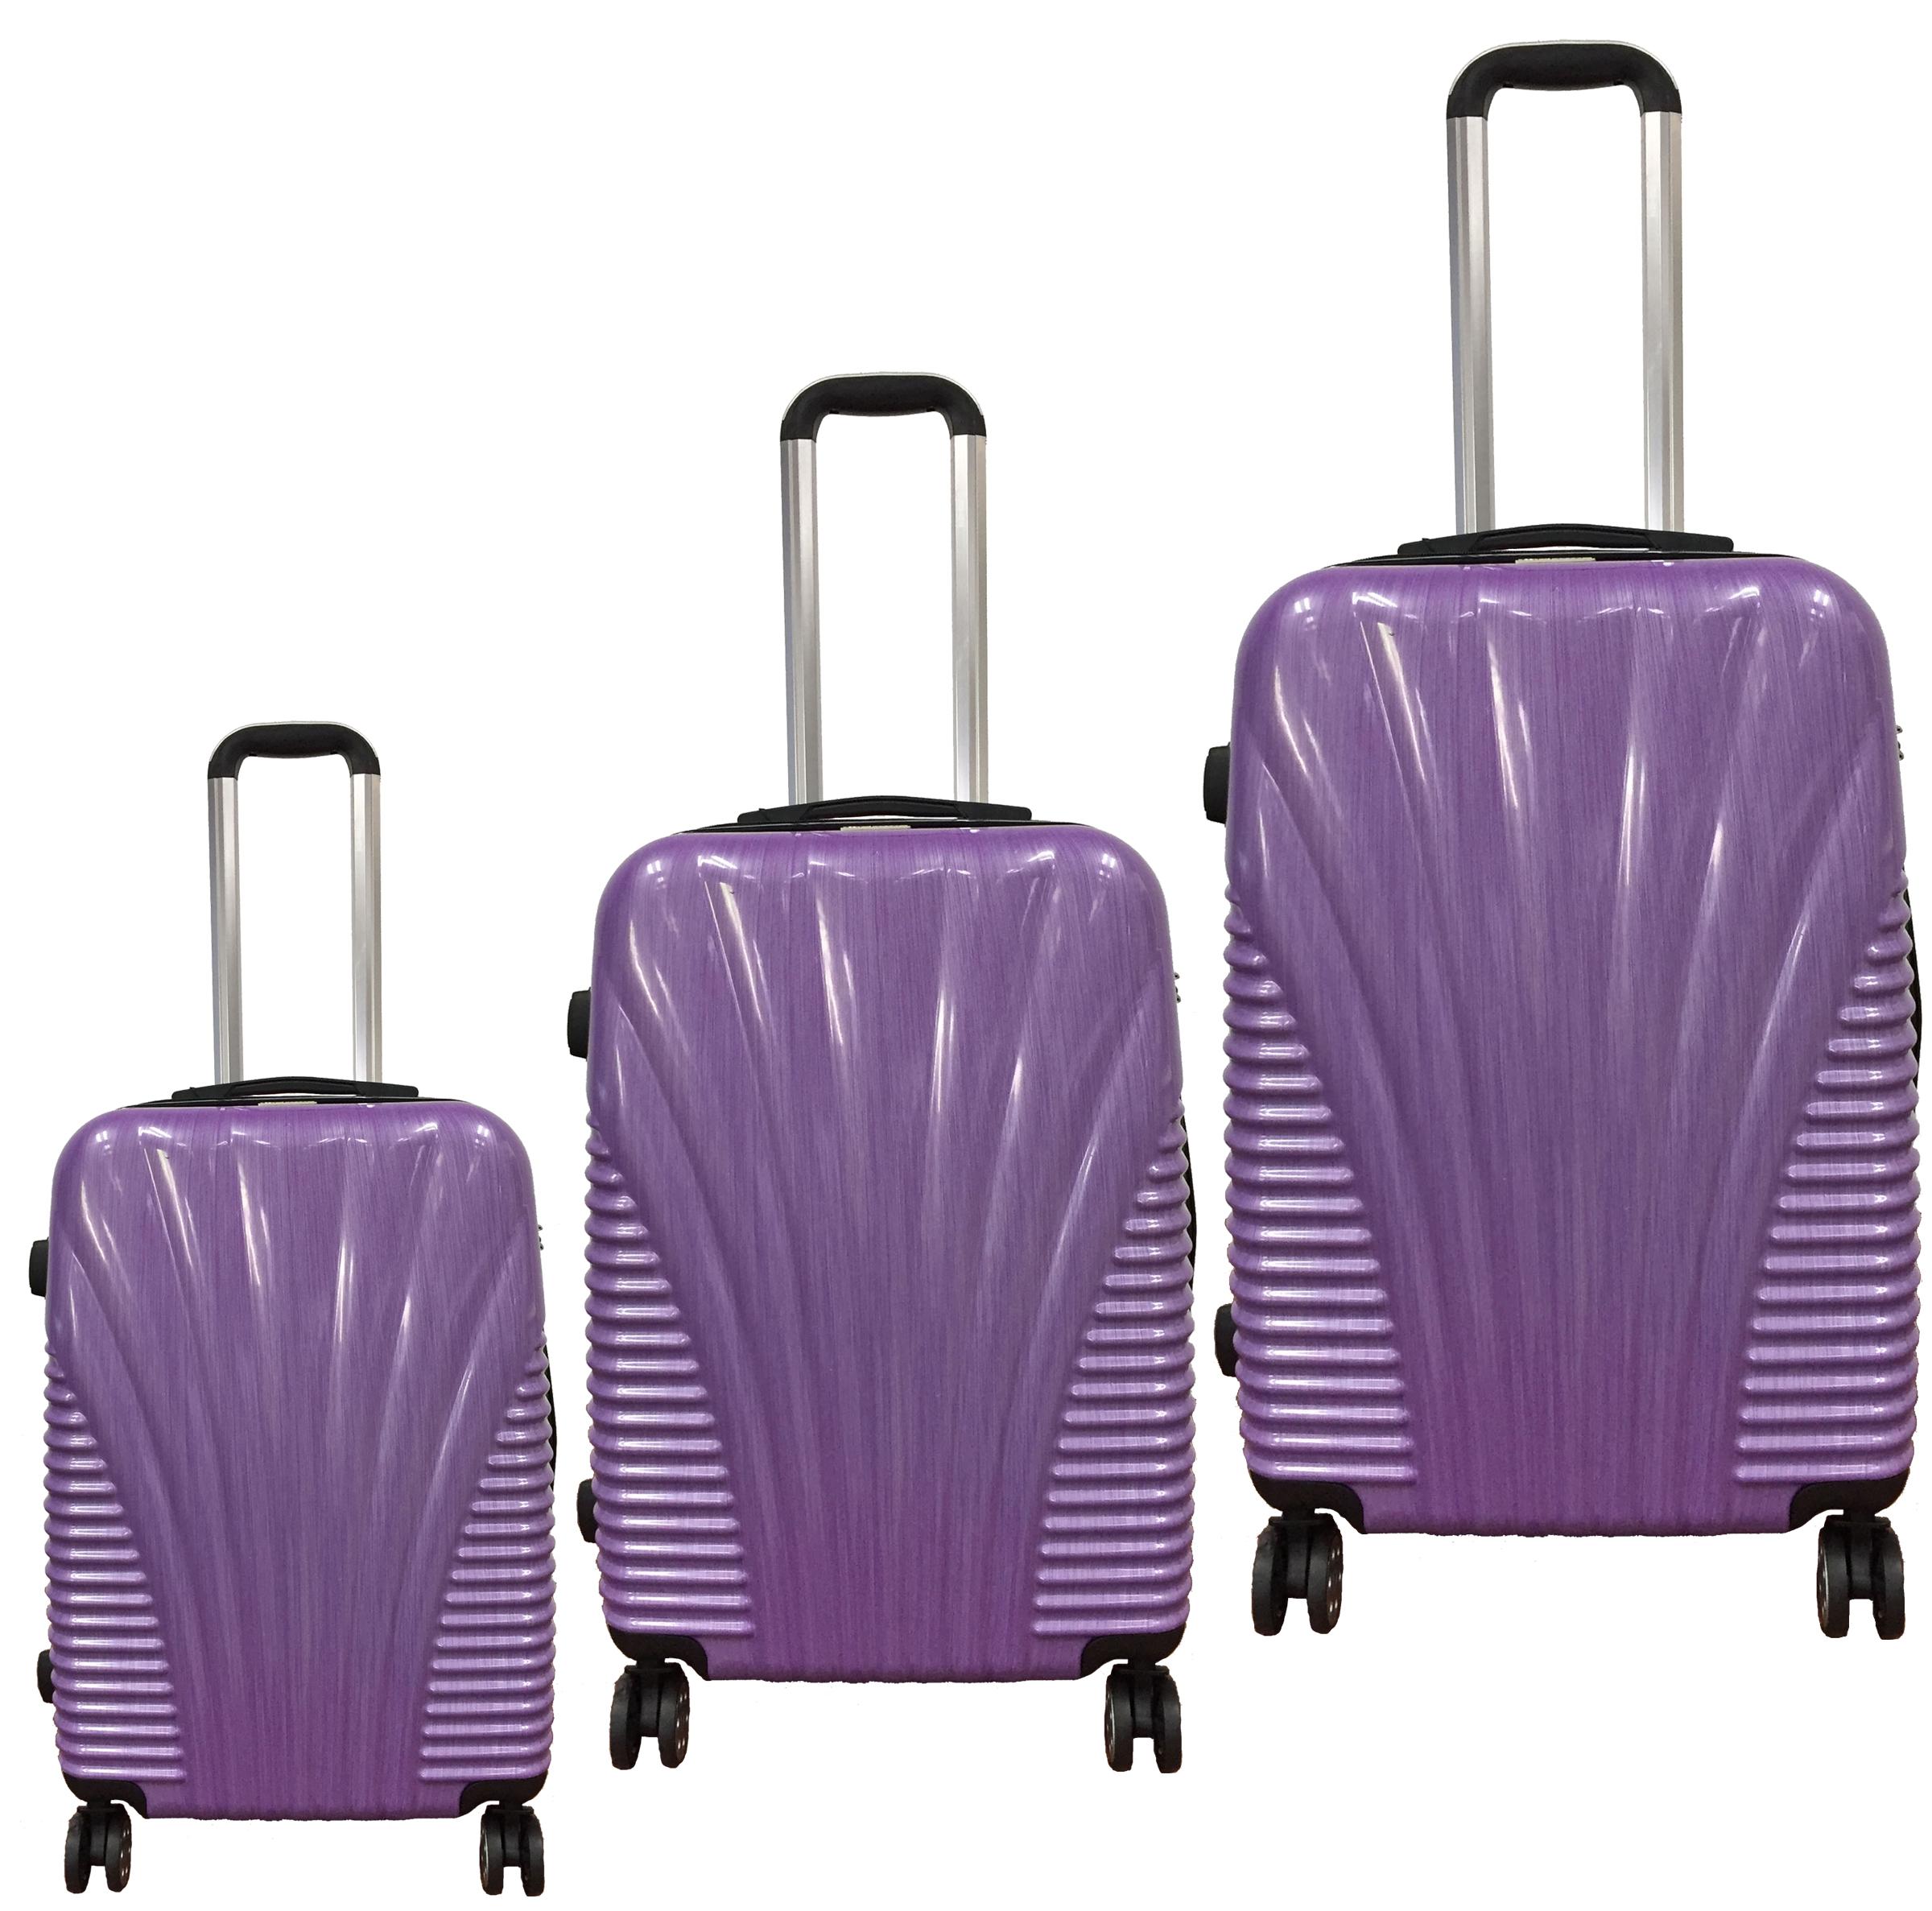 ebdf31552df5 McBRINE Light weight 3 pc Hard Sided luggage set in Green, Purple ...